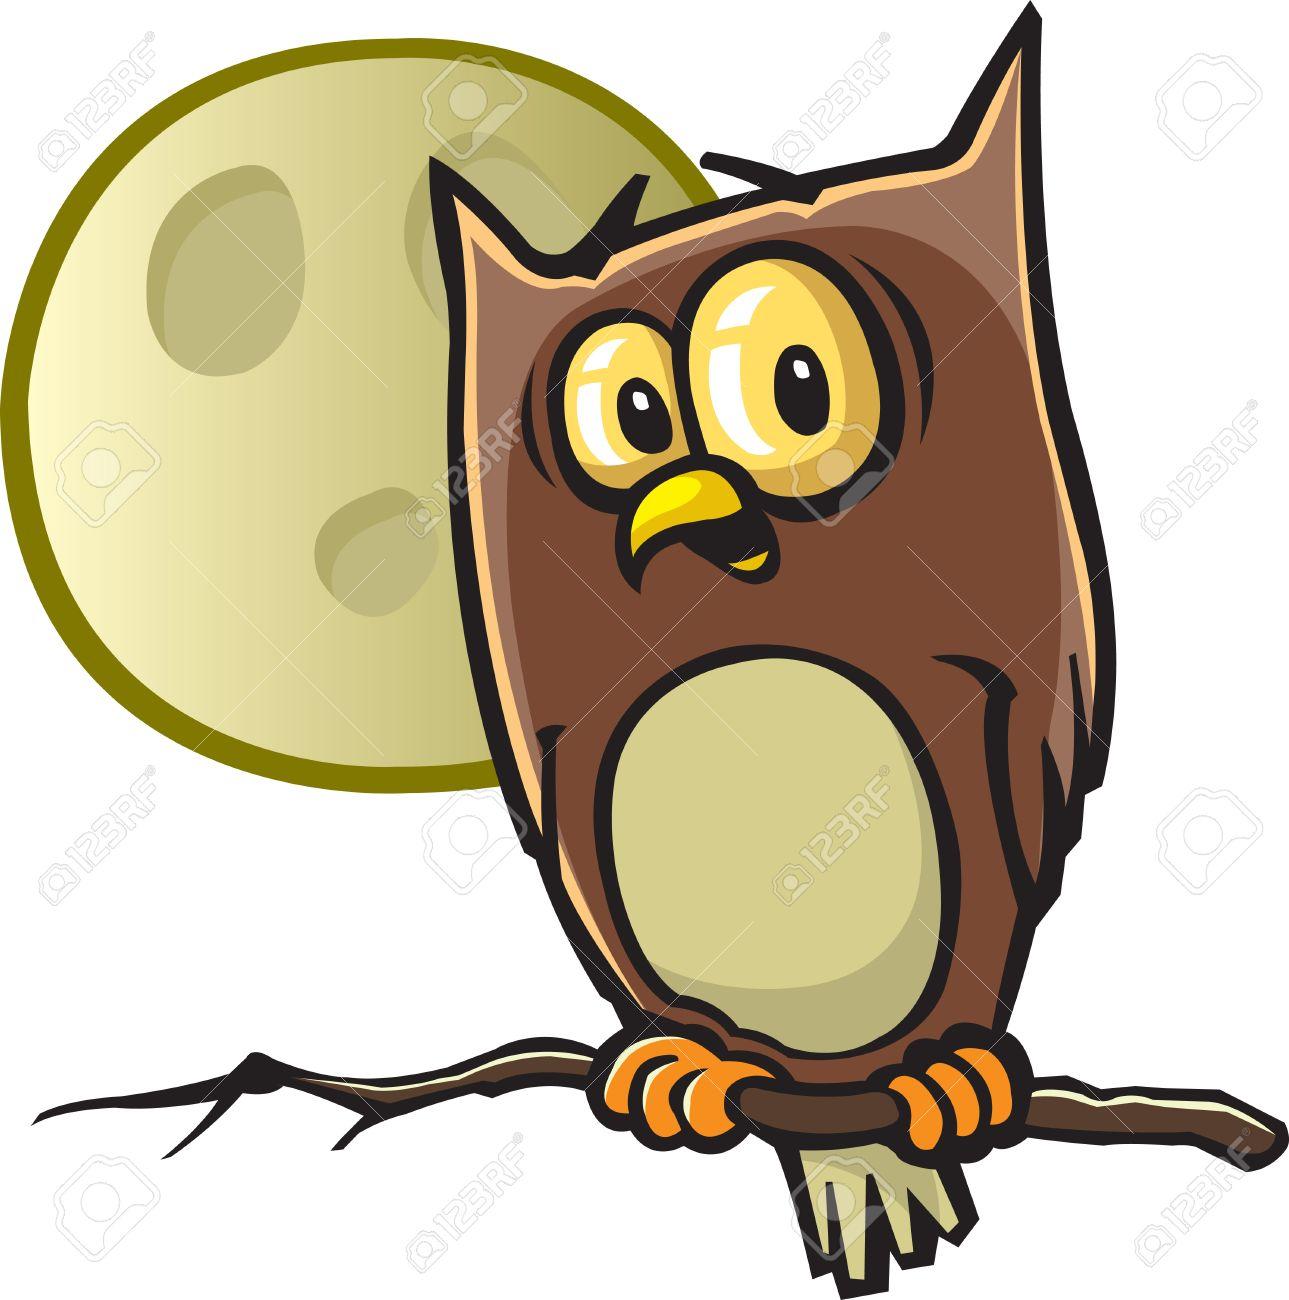 A cartoon Halloween Owl Vector and high resolution jpeg files..